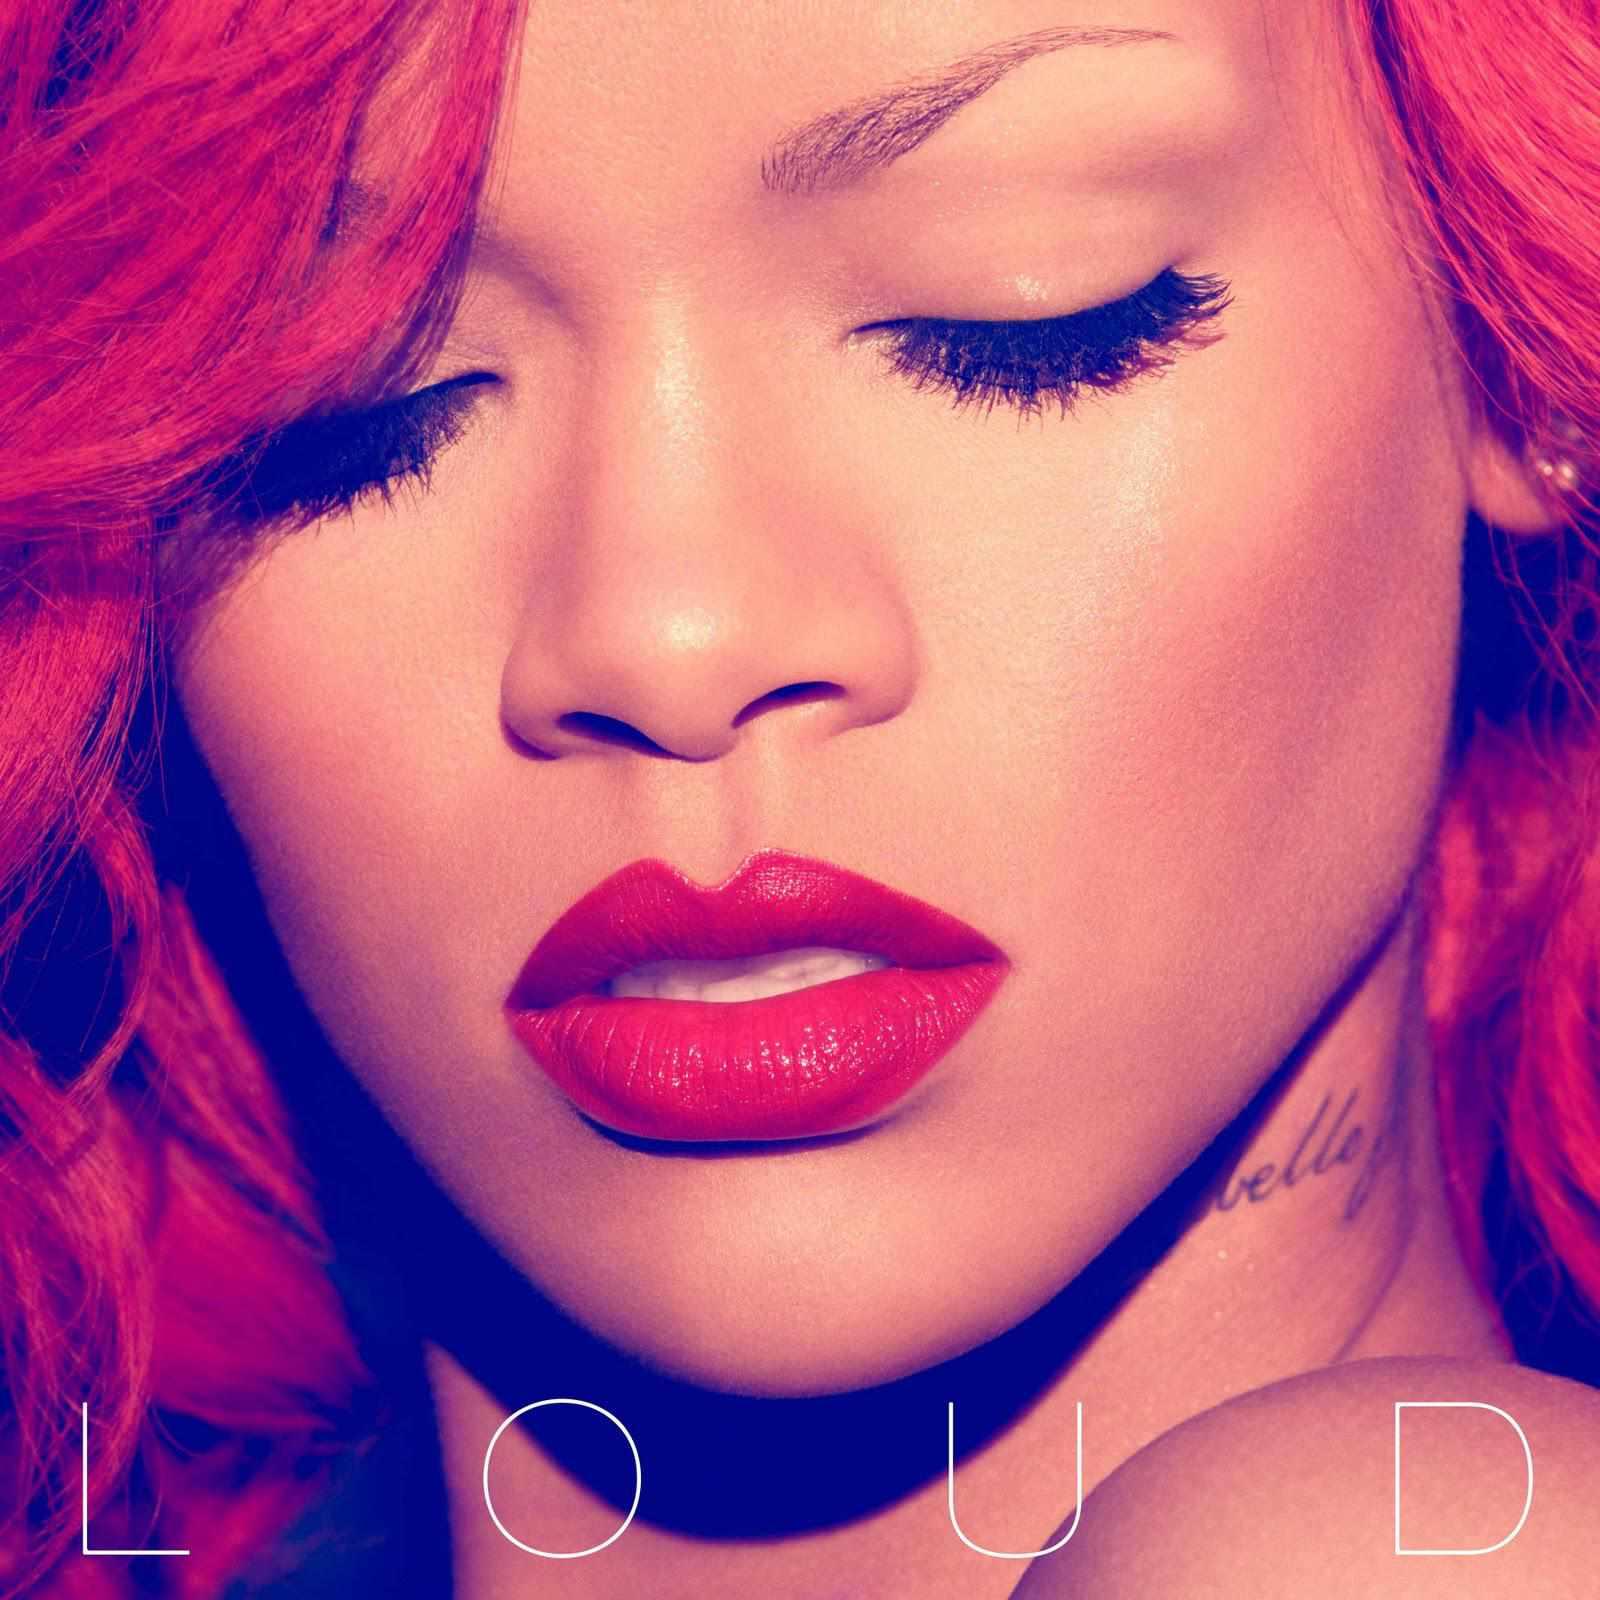 cbd29d597f2b Top 100 Best Pop Songs of 2011